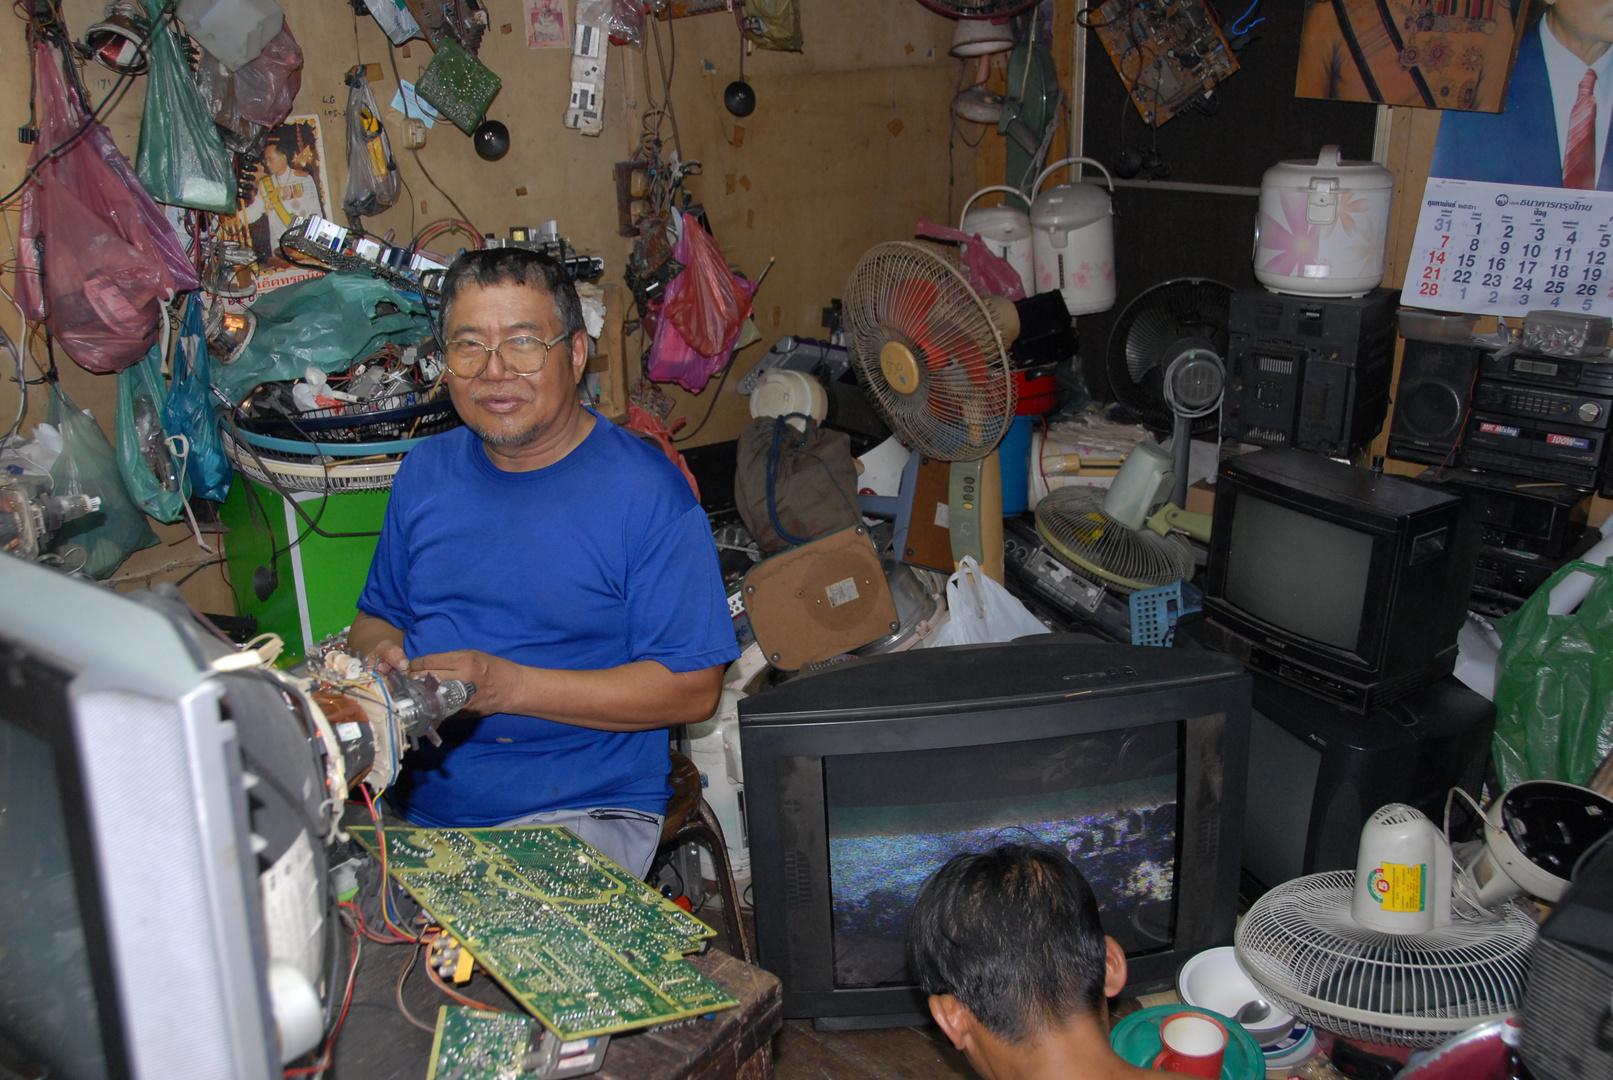 Fernsehwerkstatt in Bangkok im Stadtviertel Baan Krua